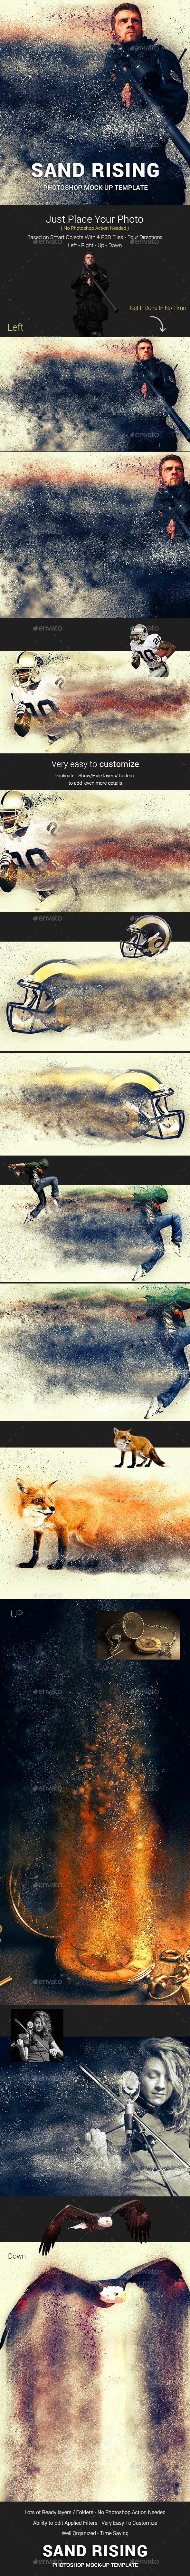 Sand Dispersion Photoshop Template Mock-Ups - Artistic Photo Templates